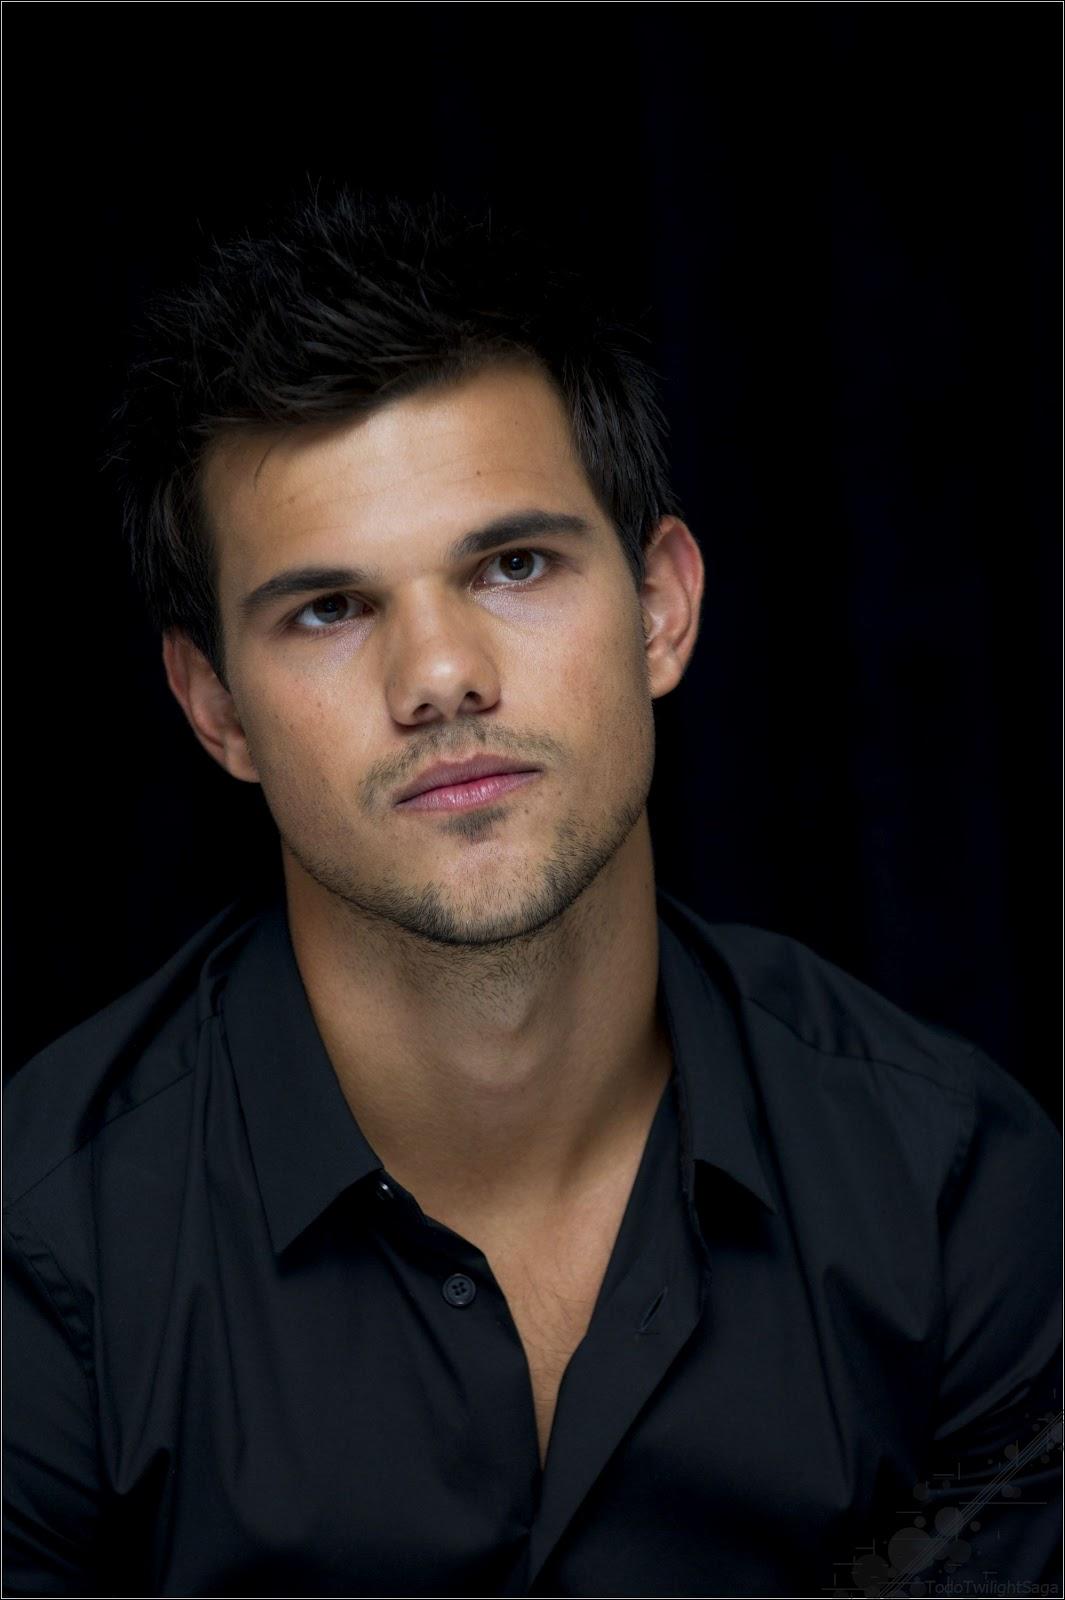 Twilight Saga: Taylor Lautner